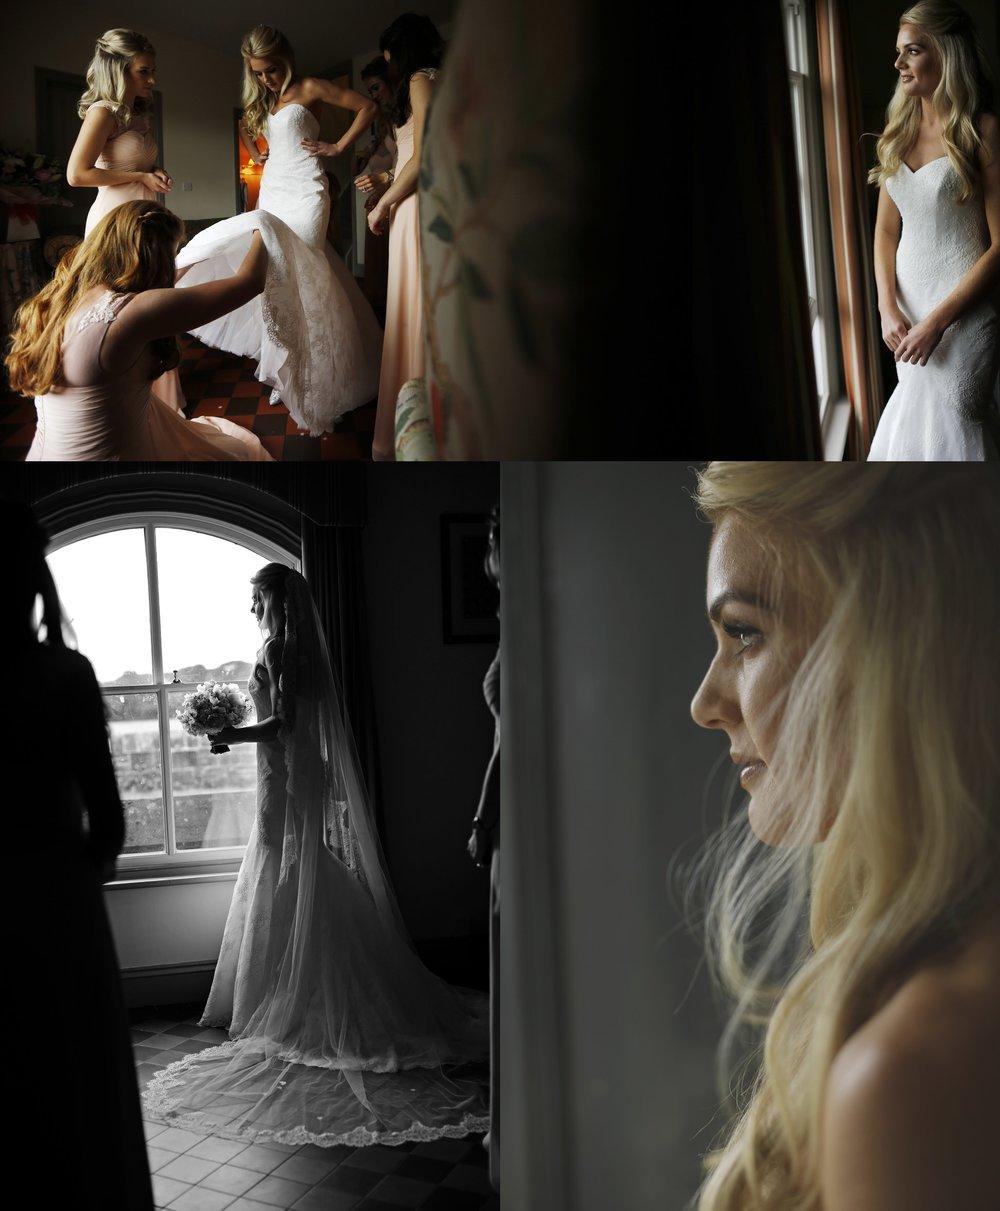 cheshire-wedding-photographer-thornton-manor-weddings_0004.jpg